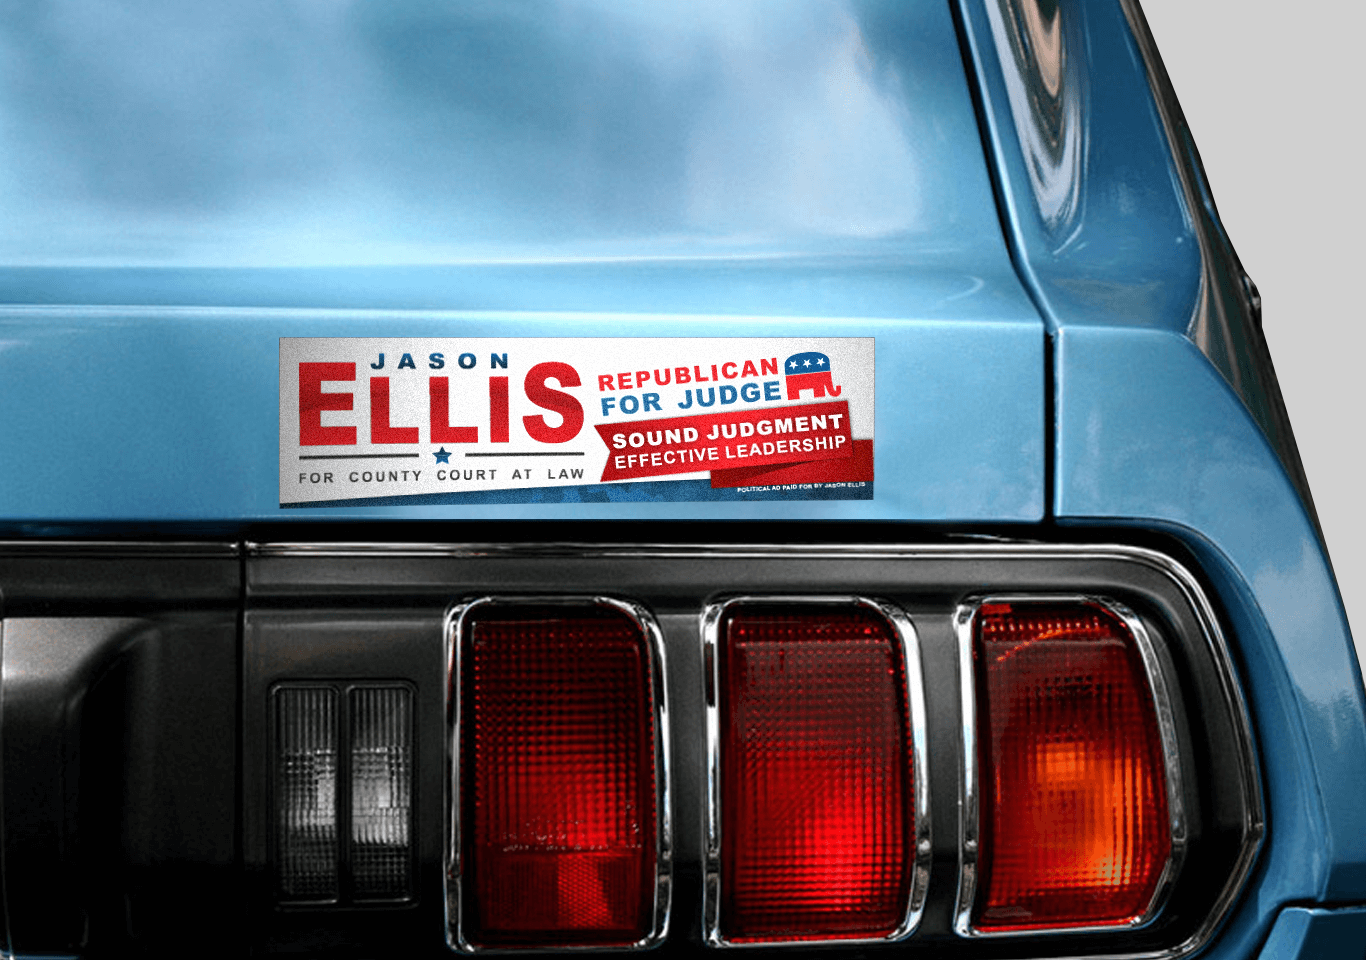 Jason Ellis Bumper Sticker